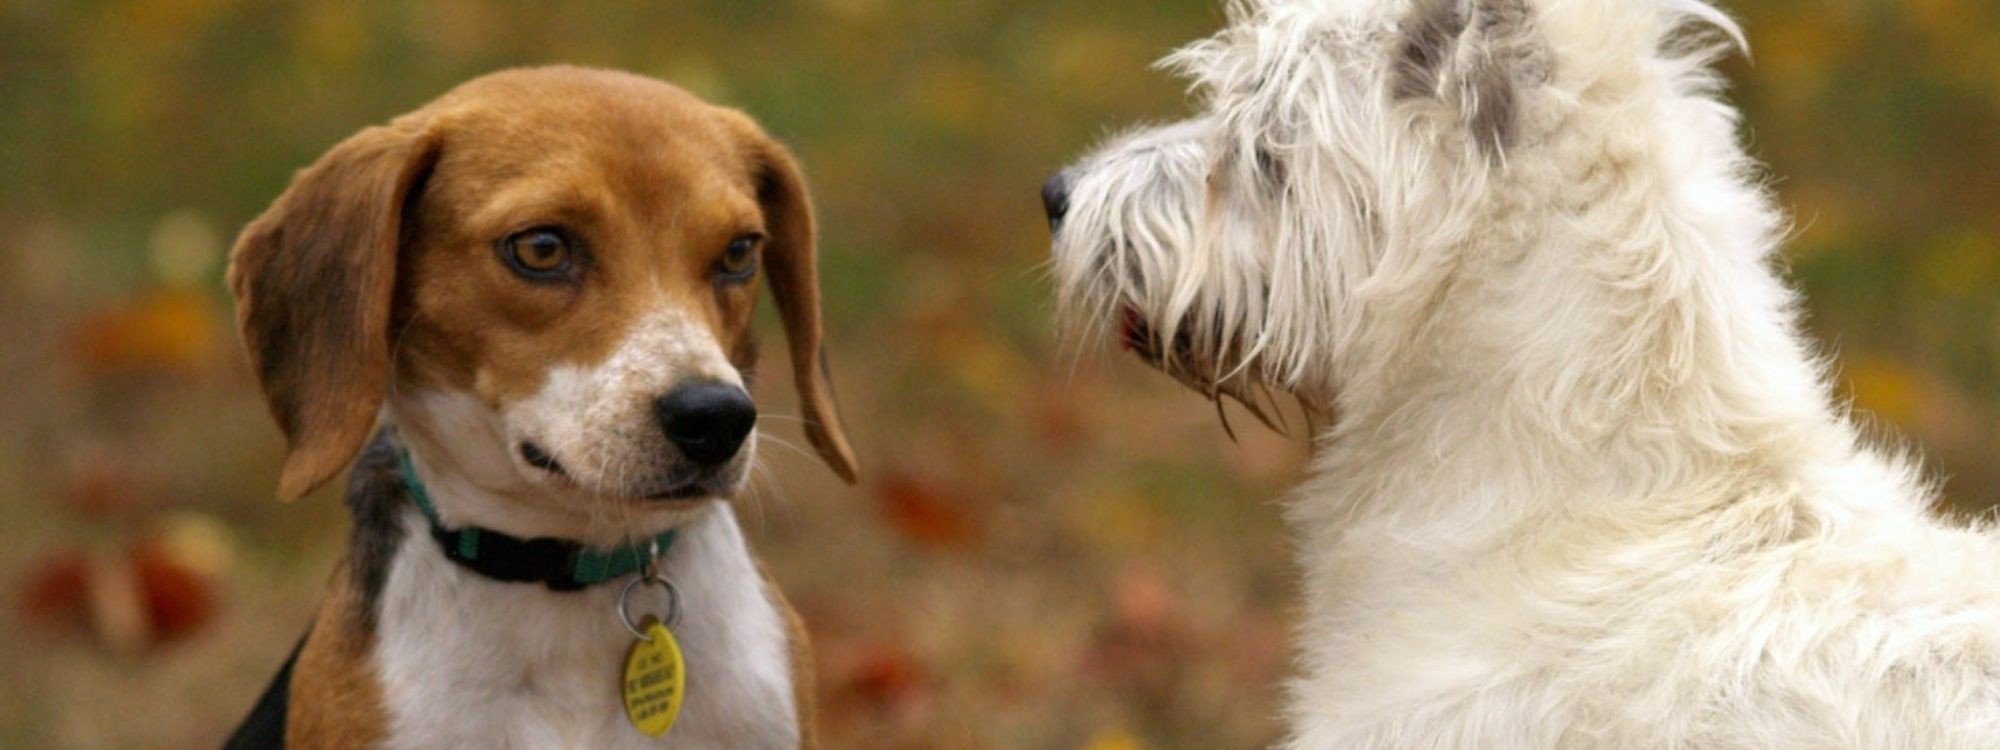 Pet Wellness Checkups